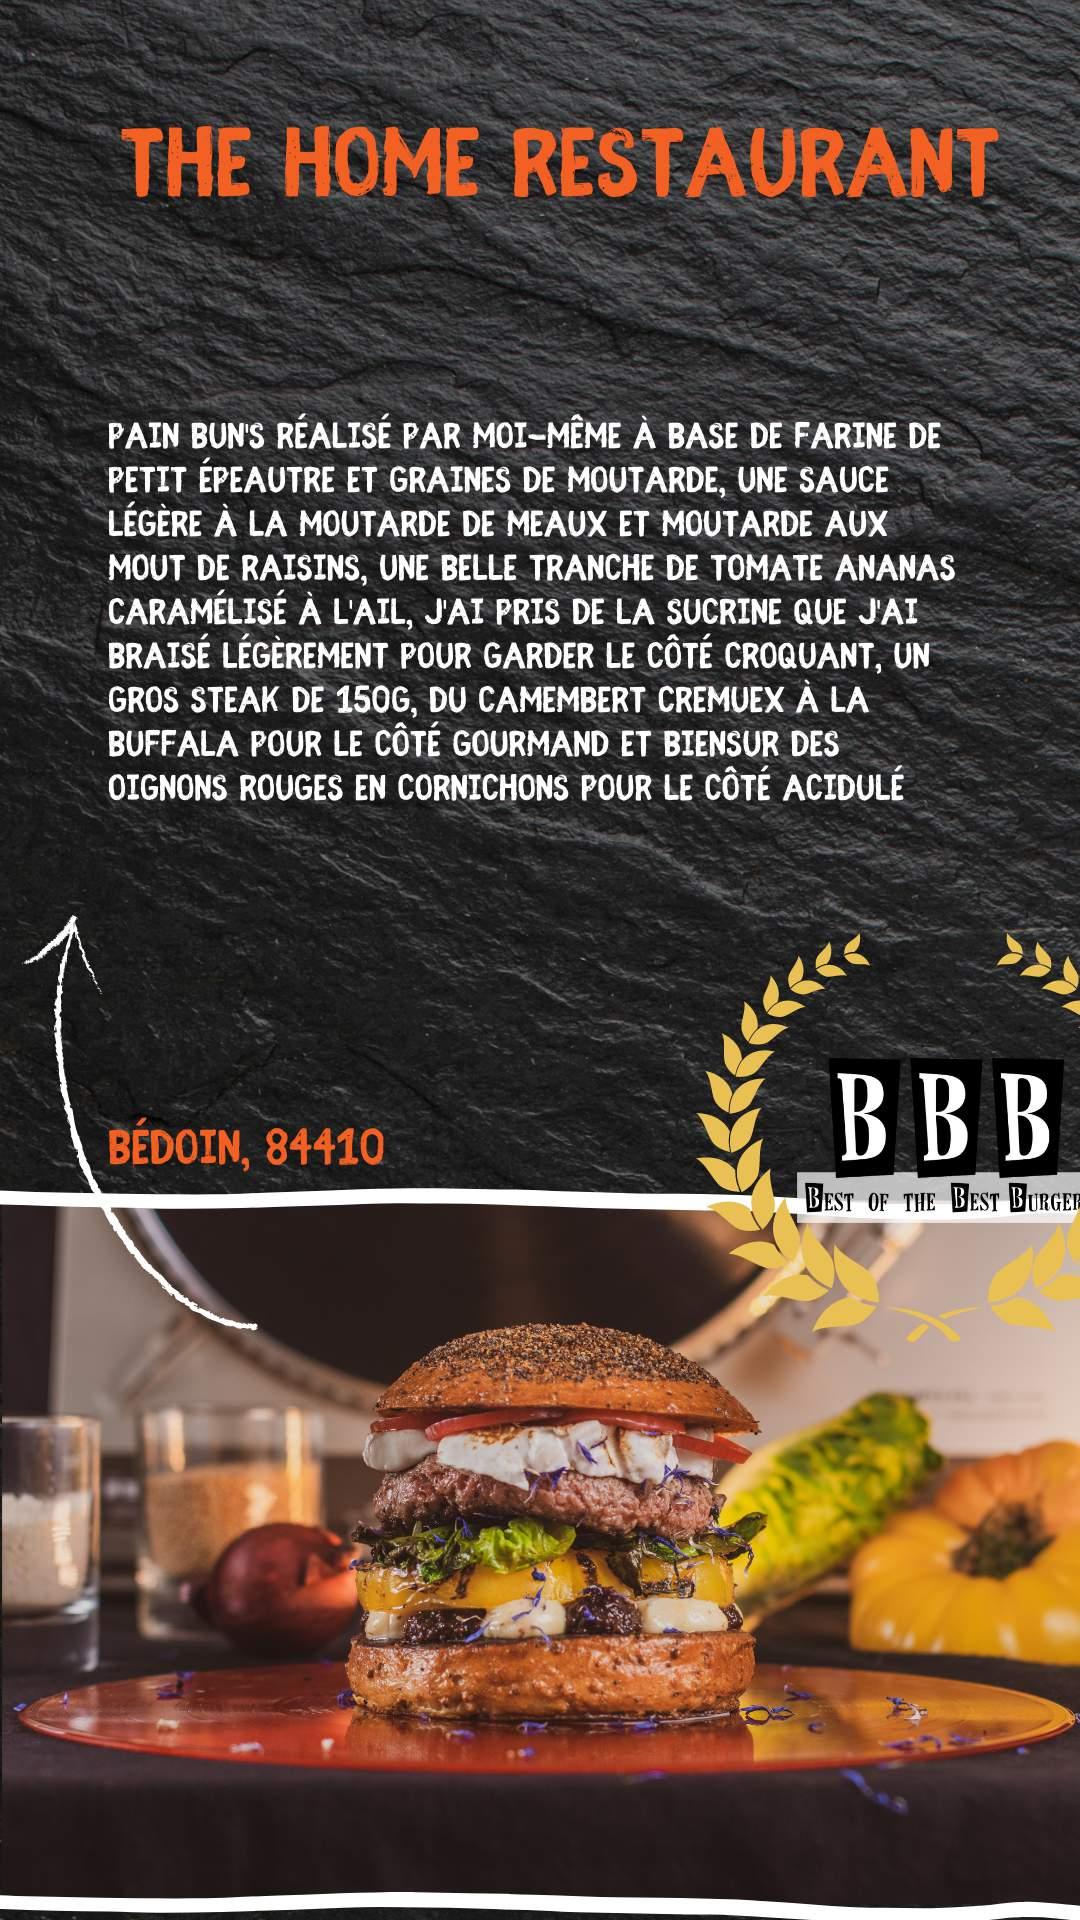 Burger du The Home Restaurant